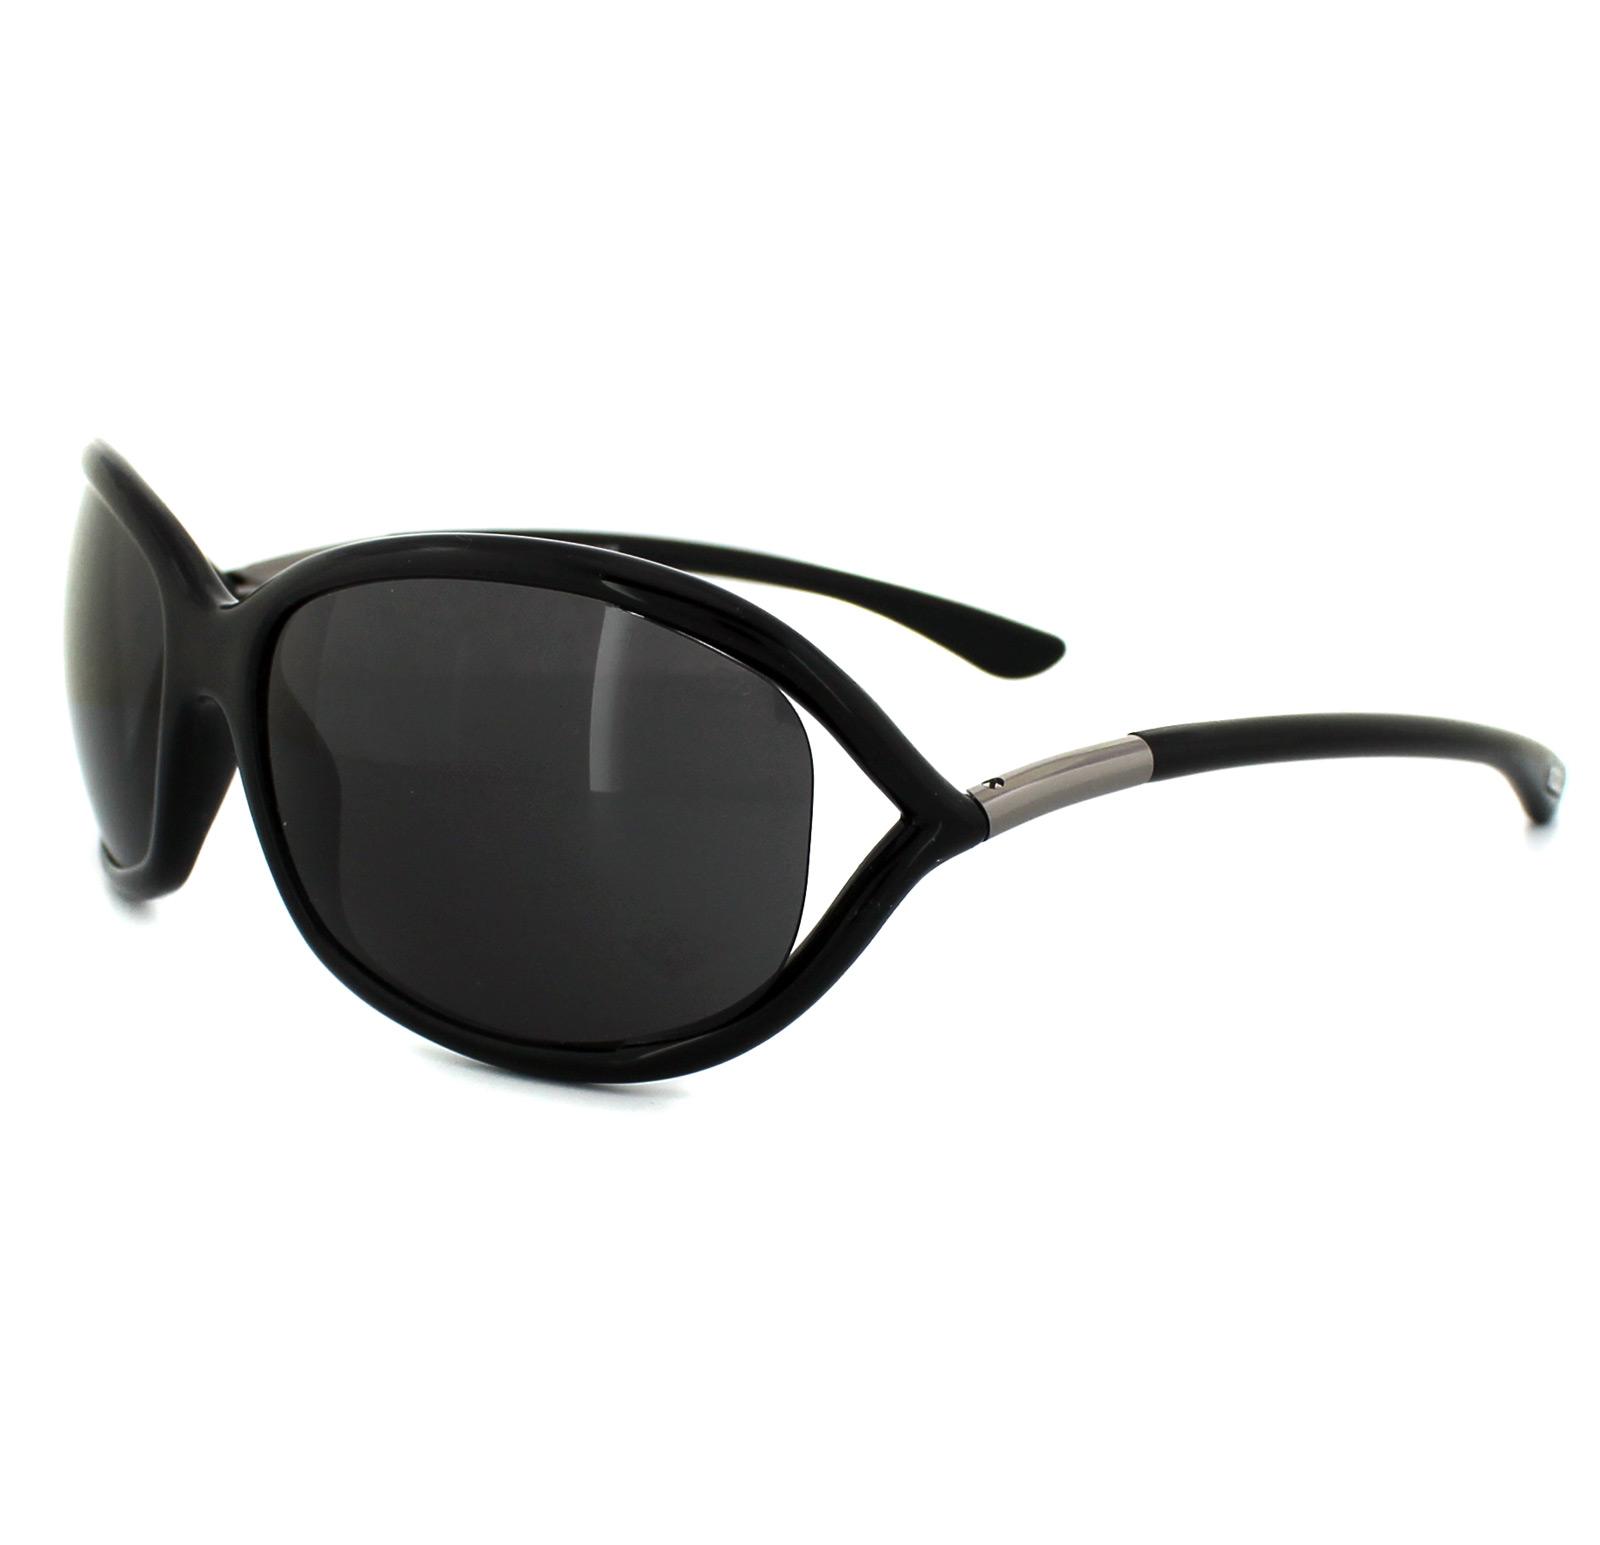 84c92b45072 Sentinel Tom Ford Sunglasses 0008 Jennifer 199 Shiny Black Smoke Grey